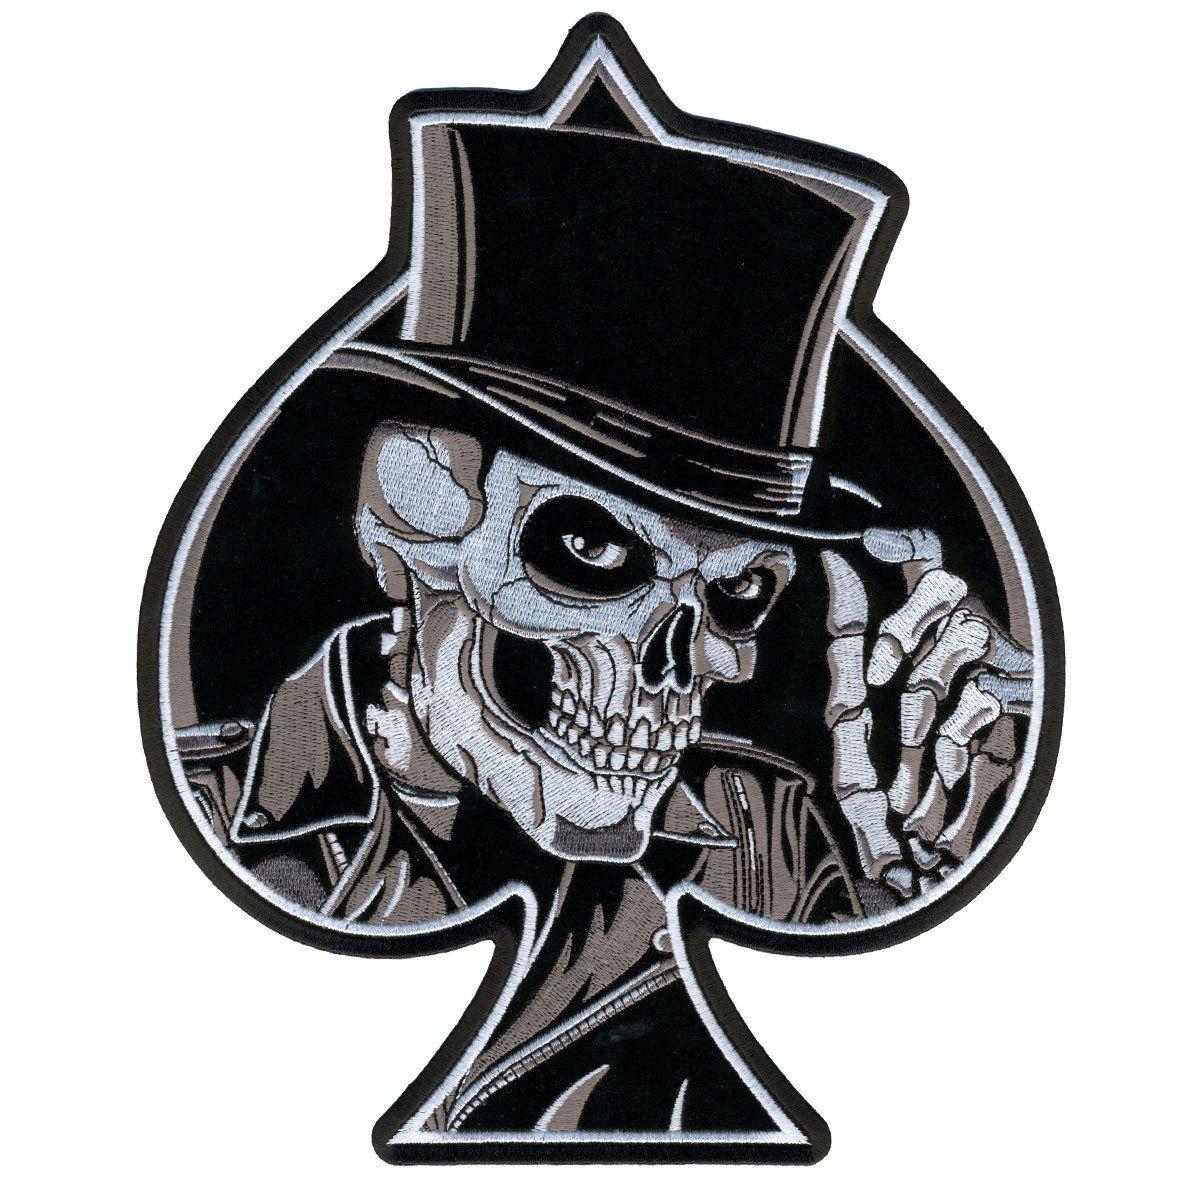 Top Hat Skull Embroidered Hook Back Patch 4 Skull Skull Patch Skull Art